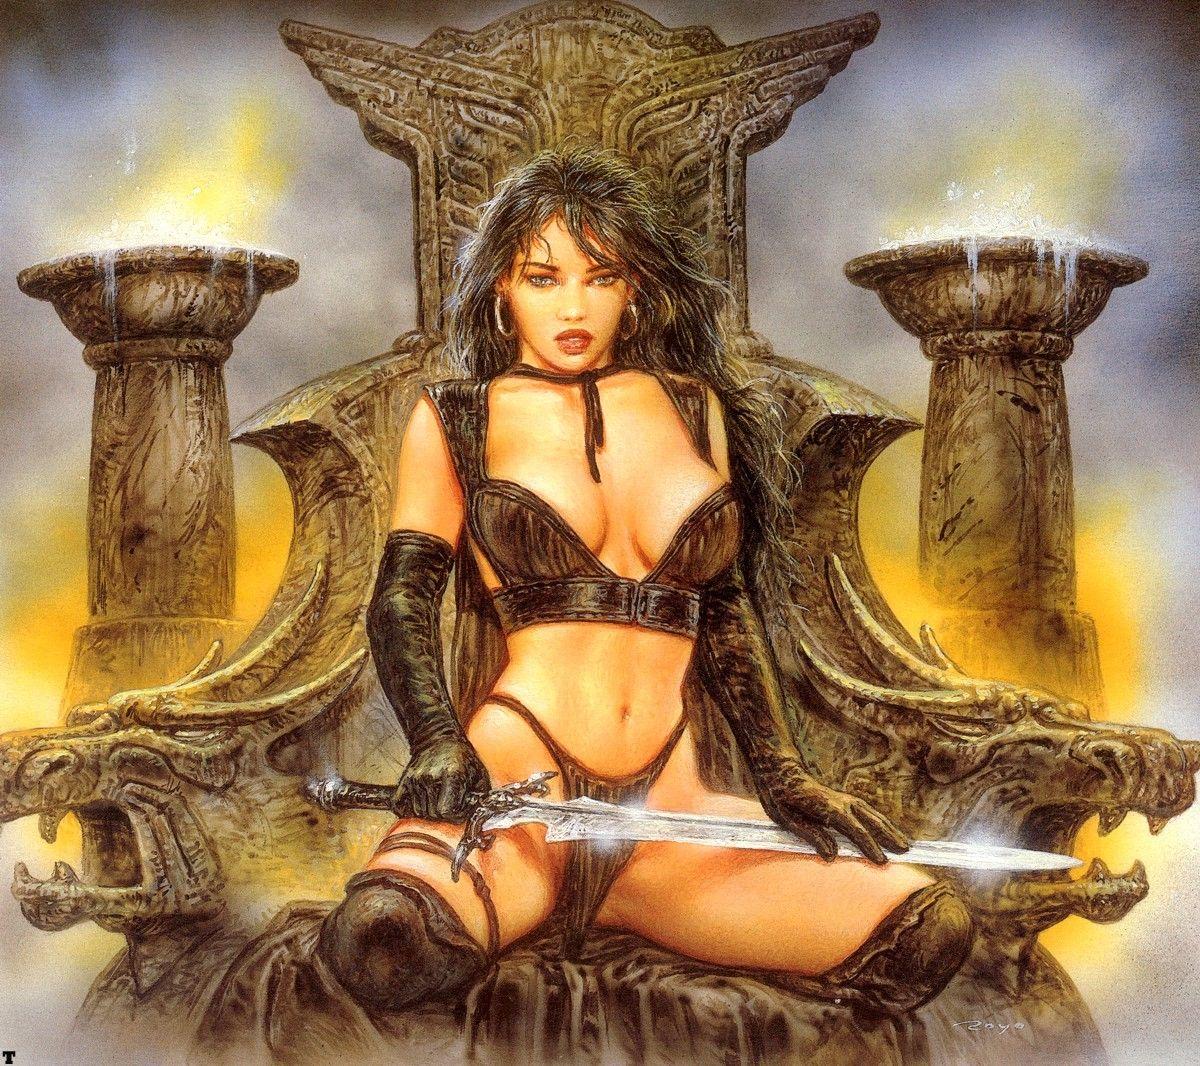 Fallen angel heavy metal porn music video 9